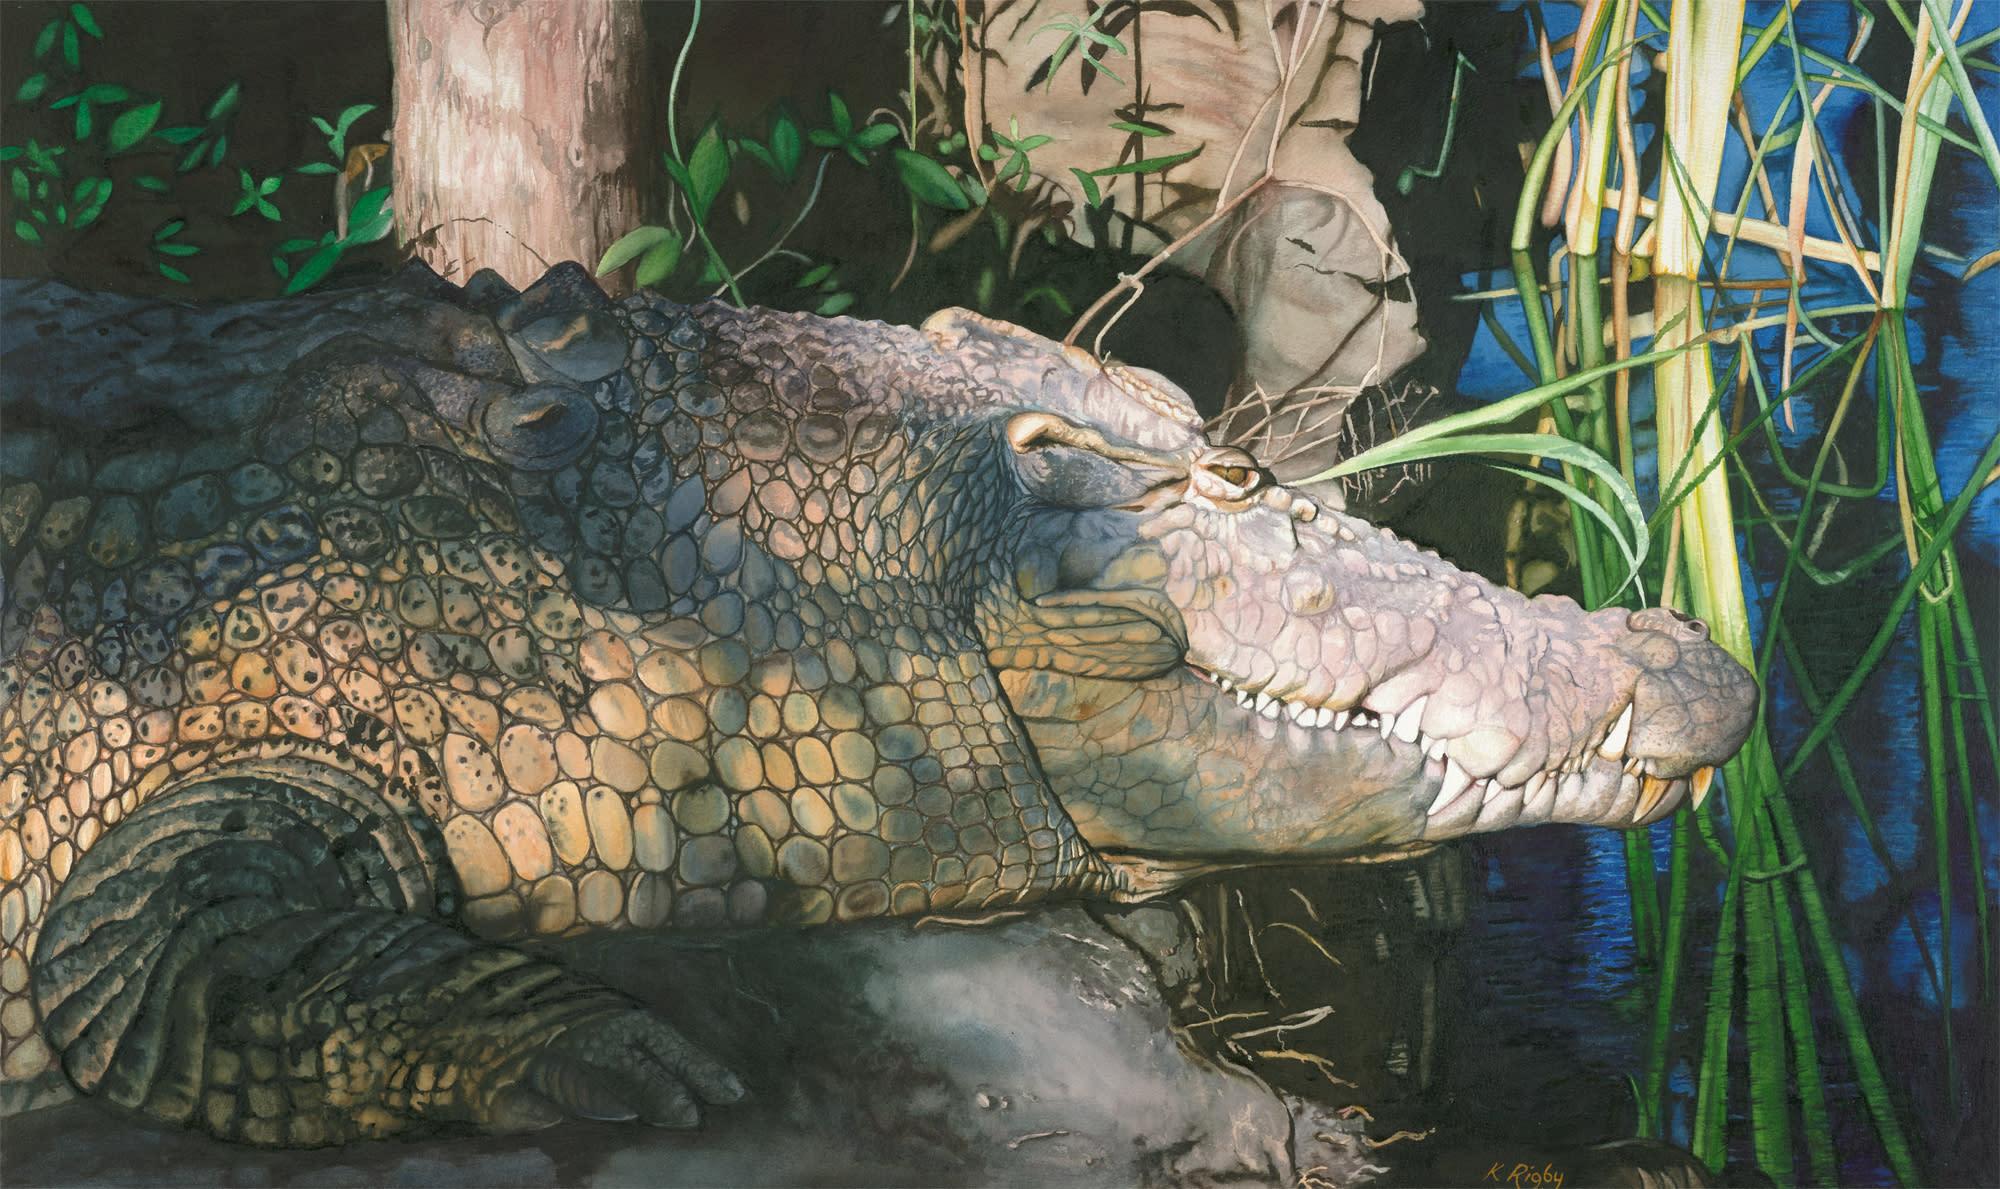 Krig 012 crocodile hizlkl